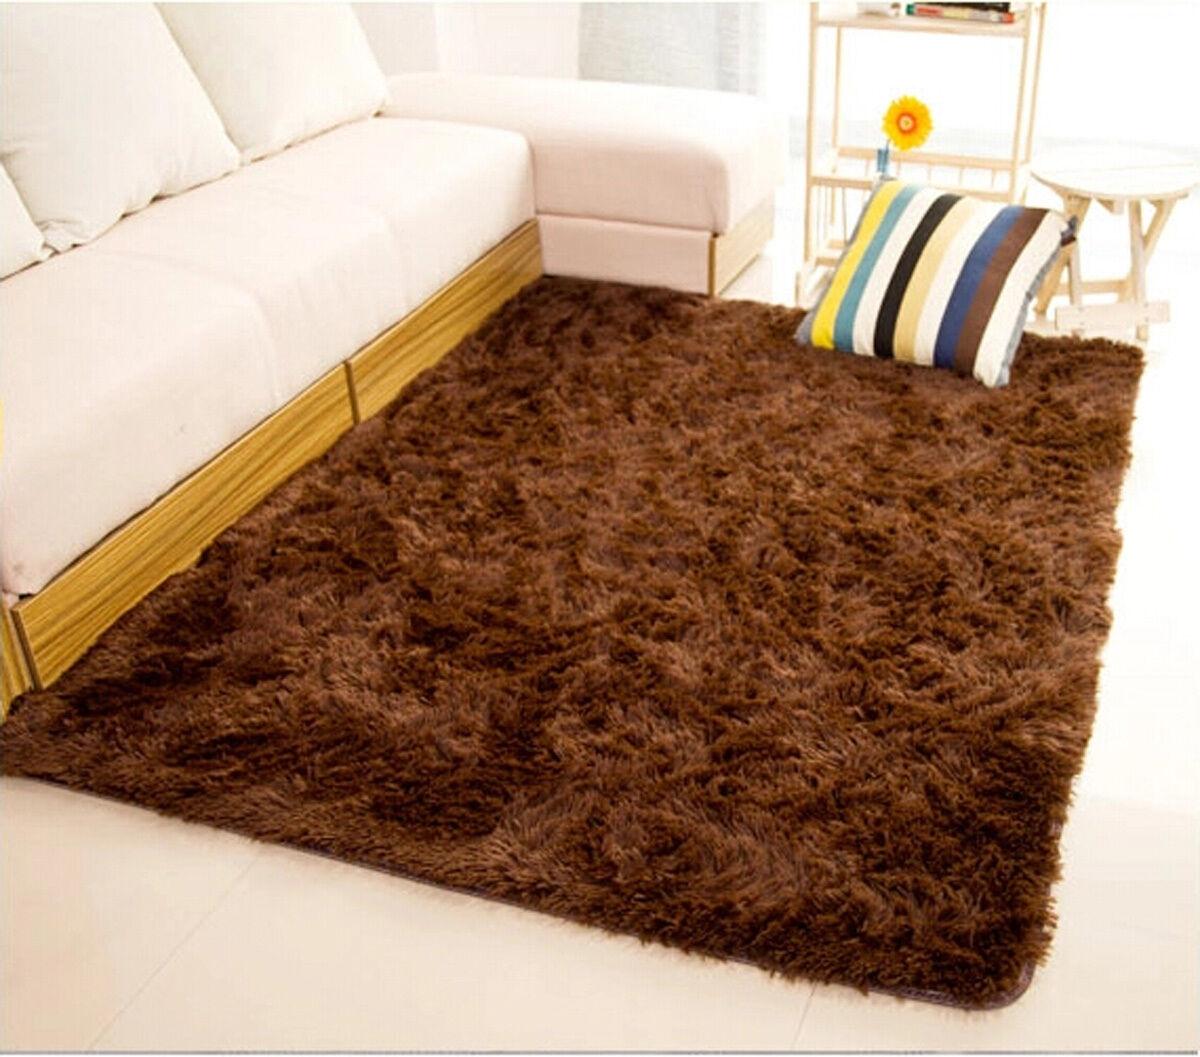 Fluffy Rugs Anti Skid Gy Area Rug Dining Room Home Bedroom Carpet Floor Mat Brown Ebay